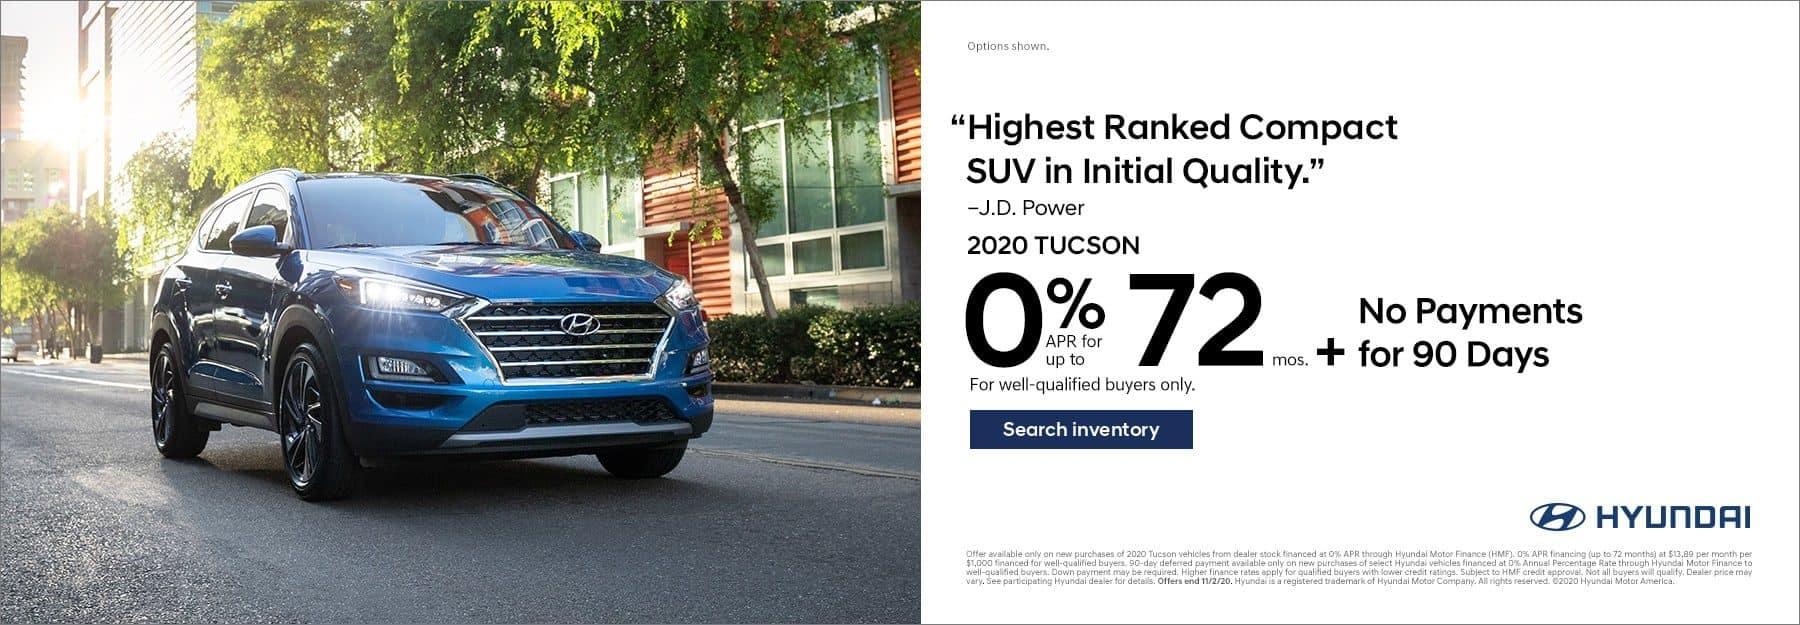 2020 Hyundai Santa Fe 0% APR for 72mo